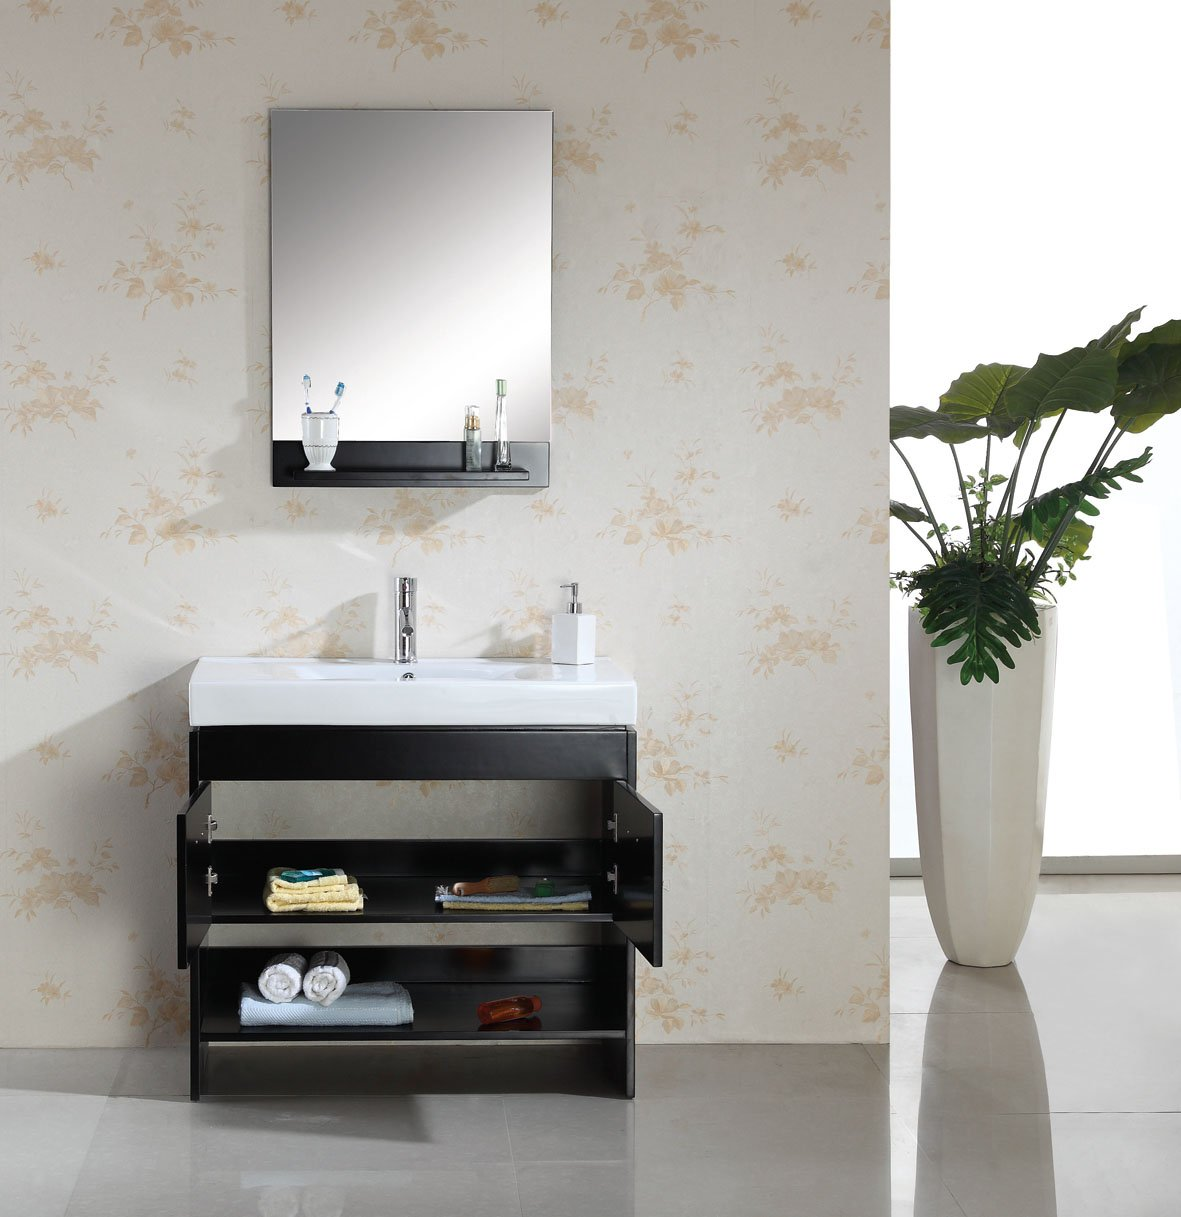 Virtu Usa Ms555ces Gloria 36inch Single Sink Bathroom Vanity Set With  Shelf, Espresso Finish   Amazon